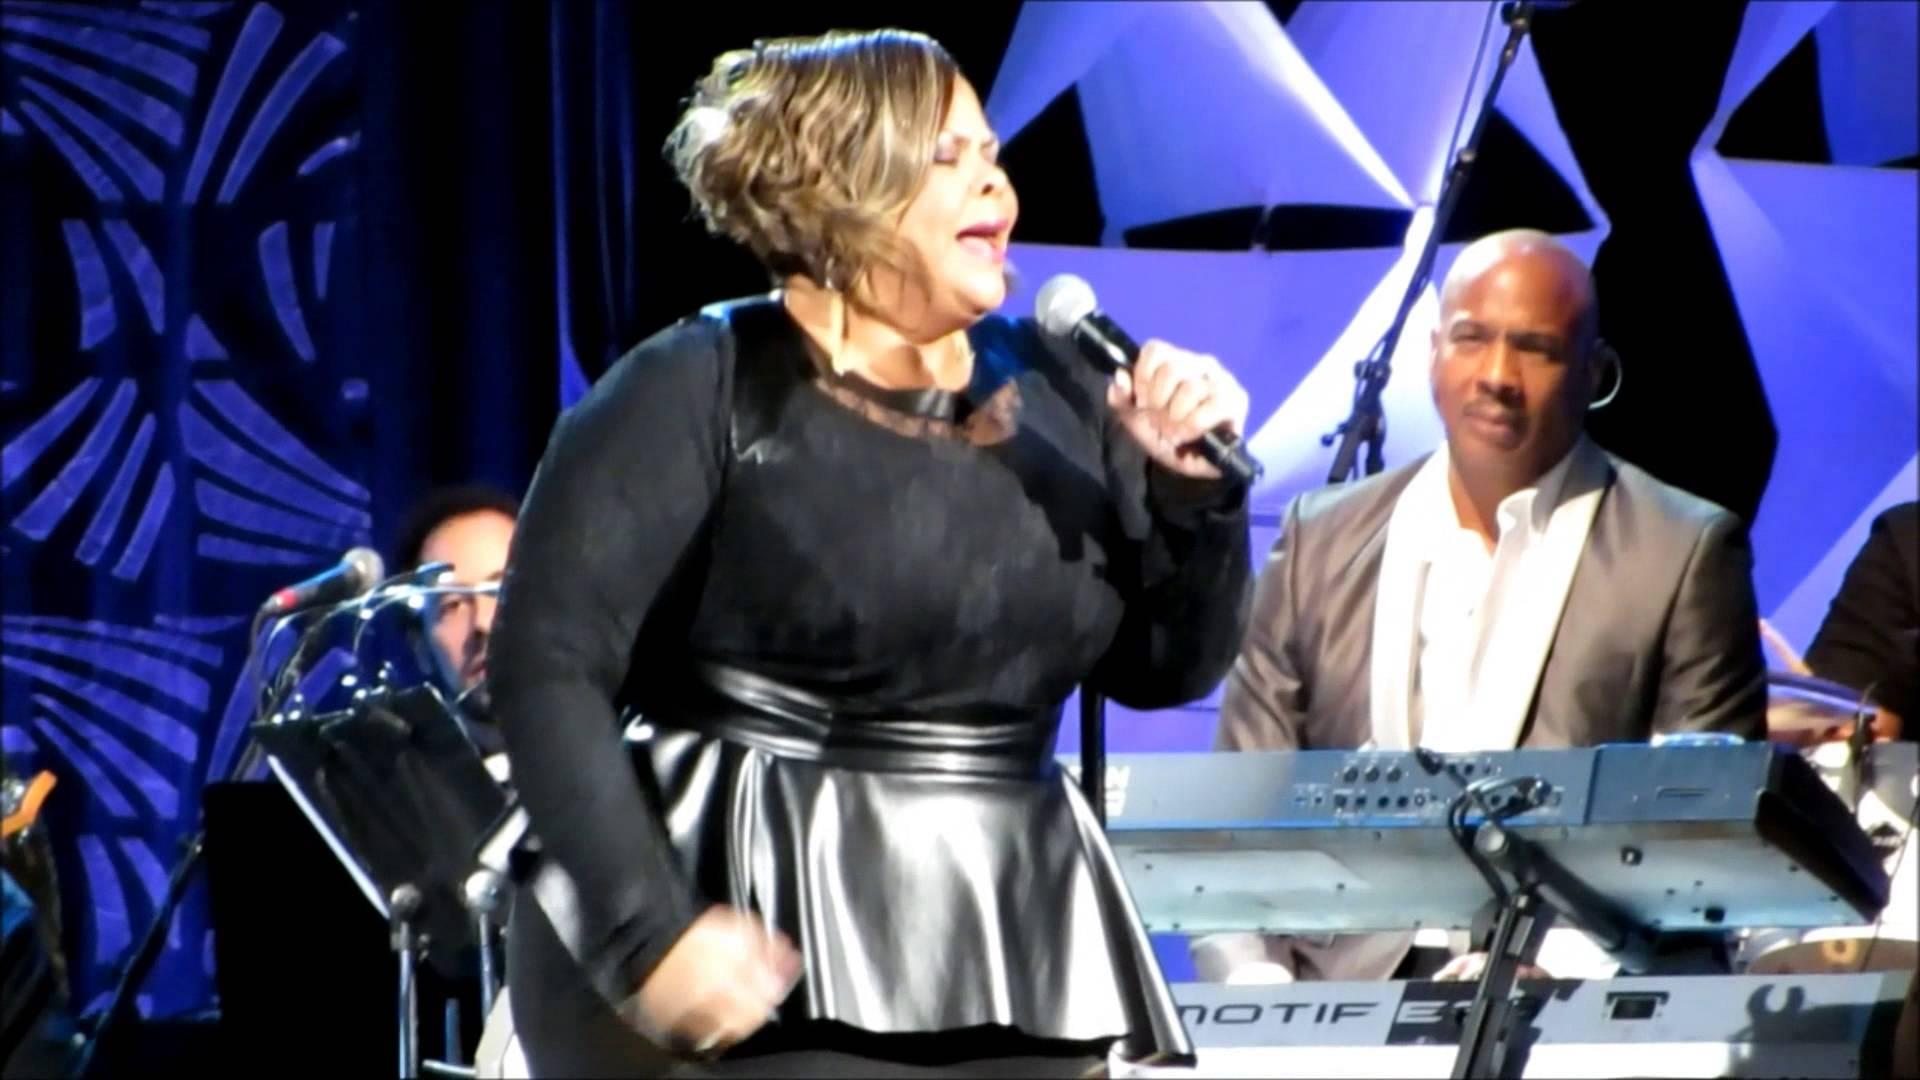 2014 Super bowl Gospel Show – Tamela Mann Take Me To The King (LIVE)